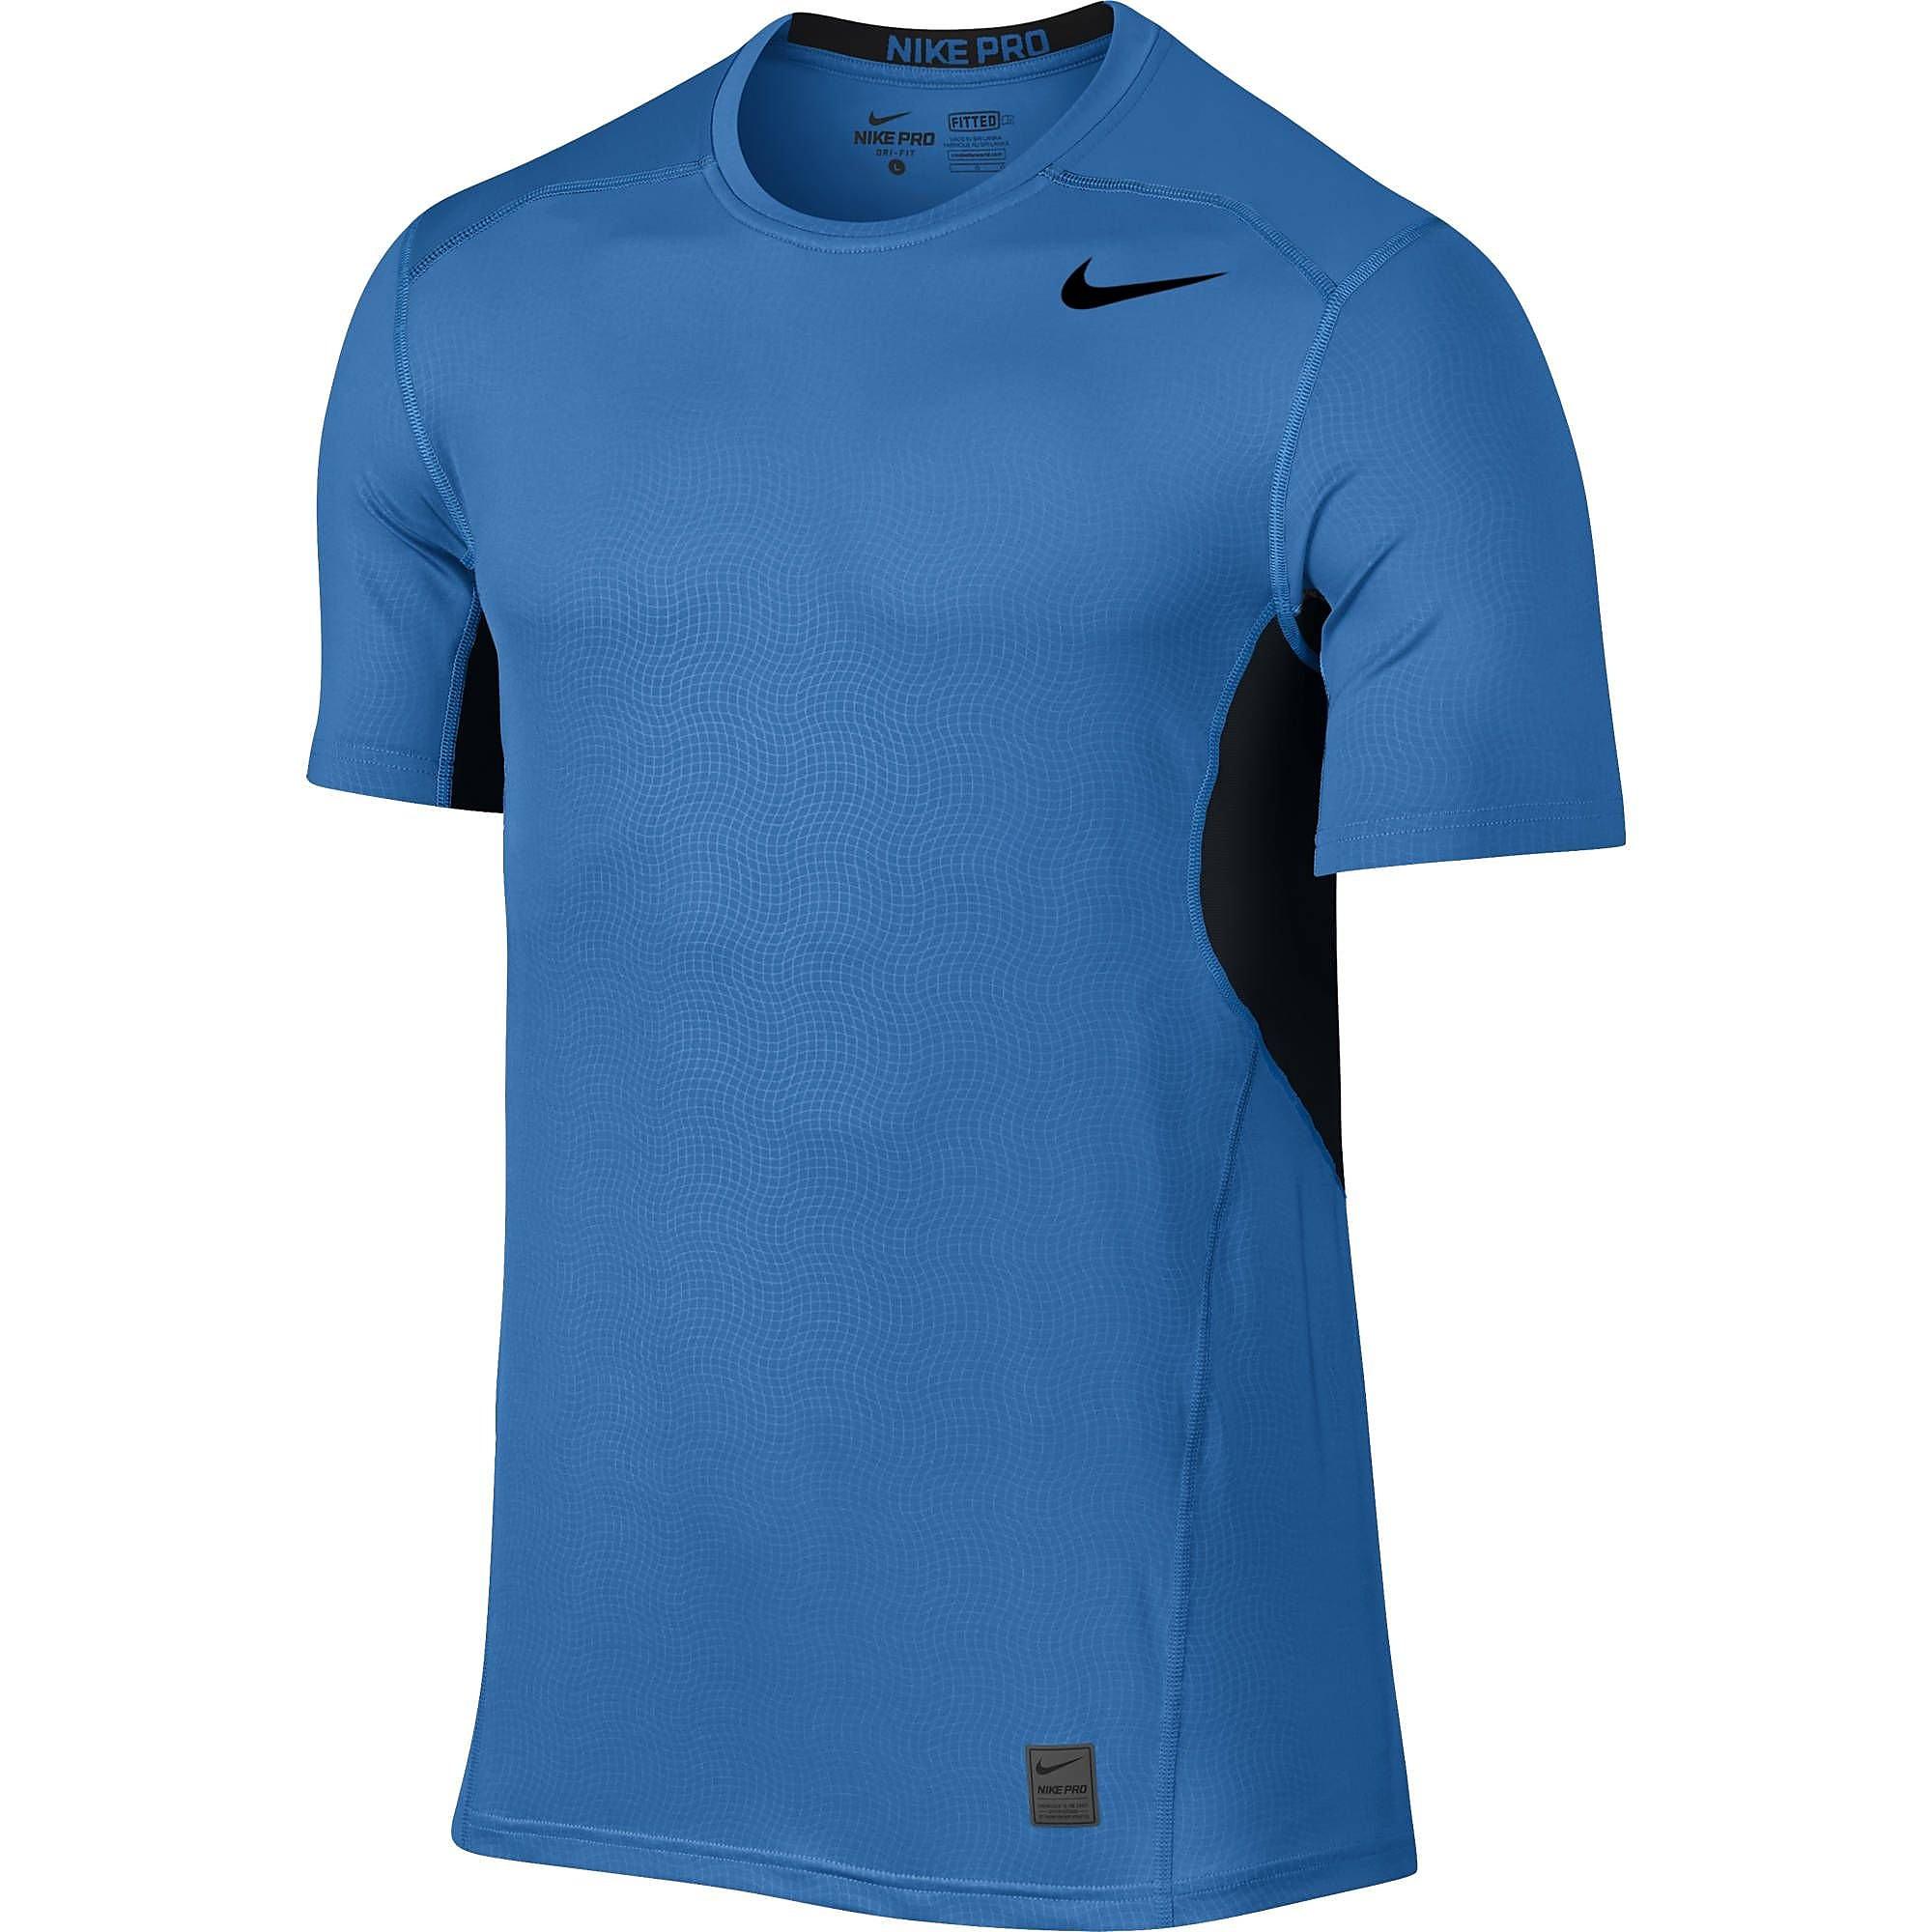 Nike HYPERCOOL FTTD SS TOP